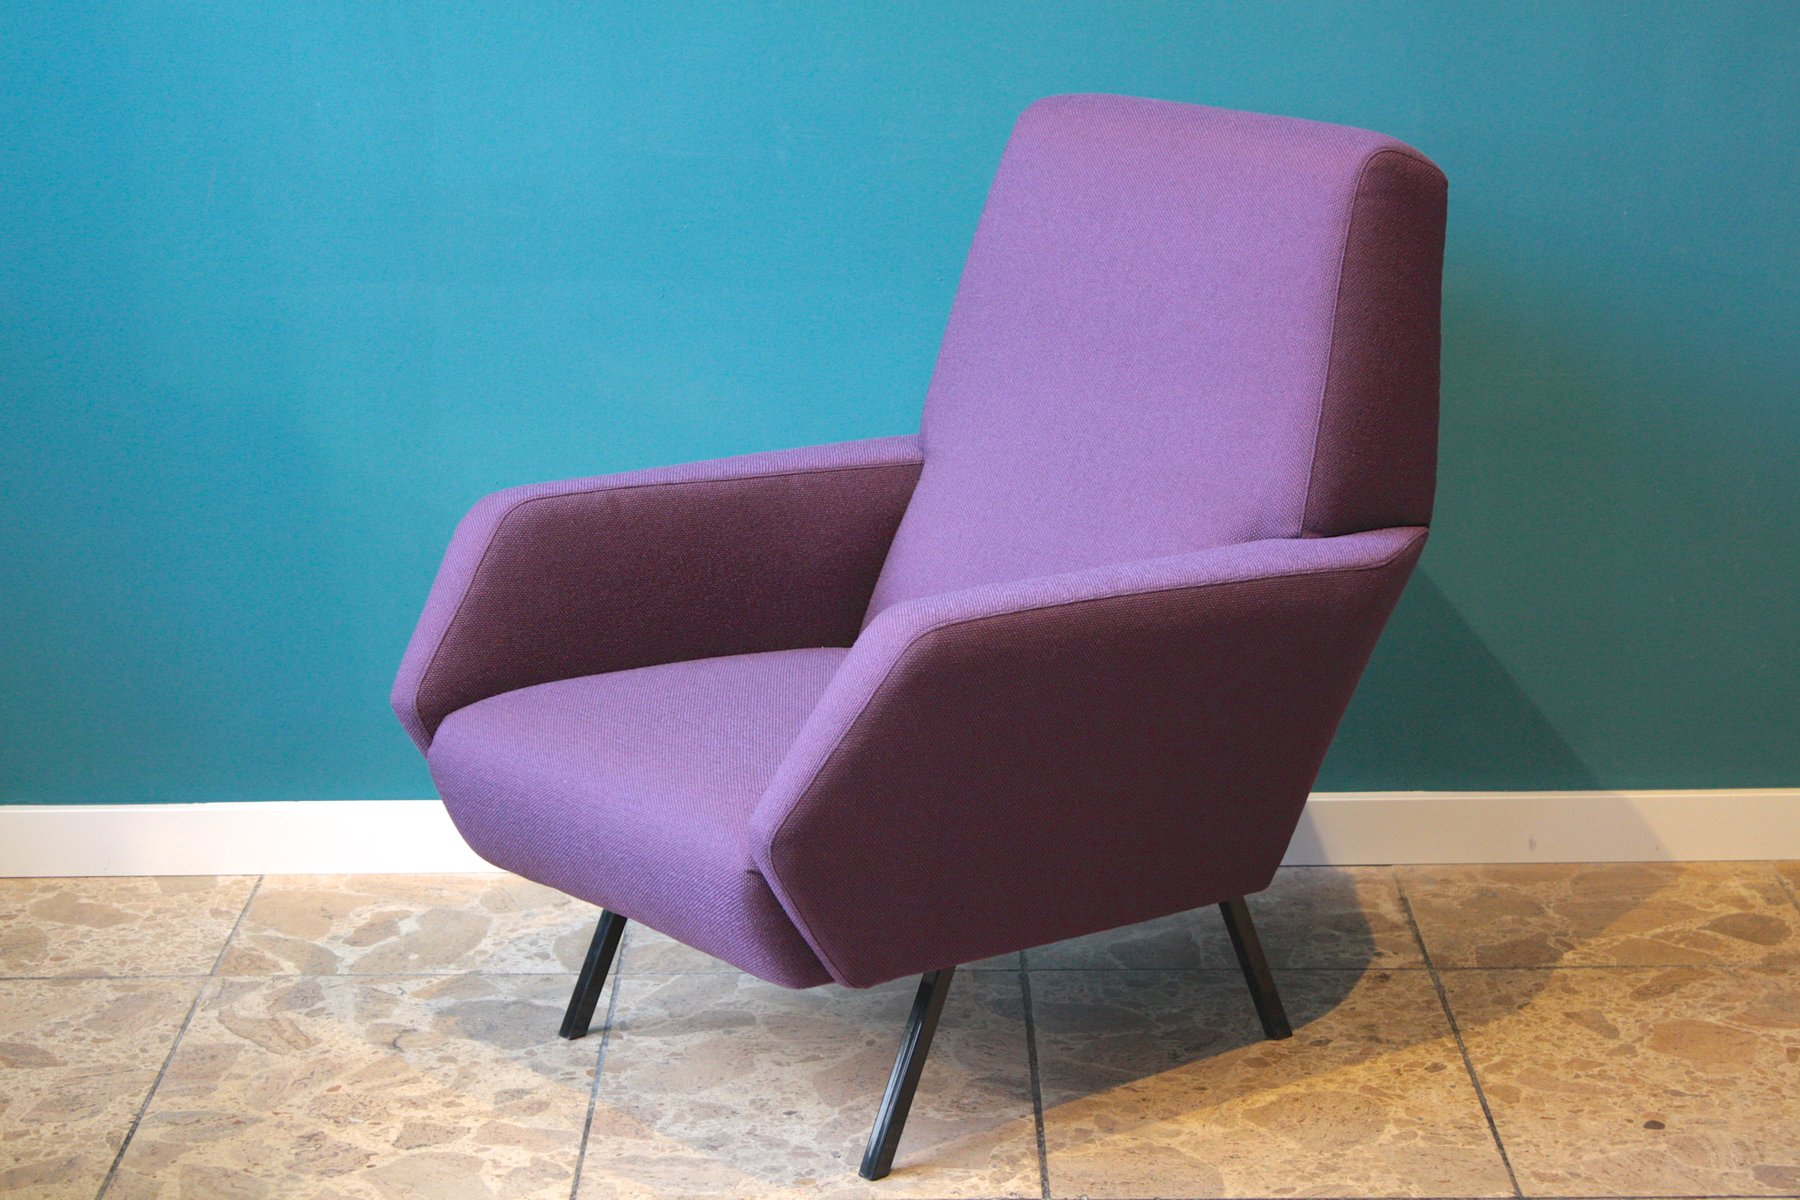 italienische sessel in lila 1950er 2er set bei pamono kaufen. Black Bedroom Furniture Sets. Home Design Ideas